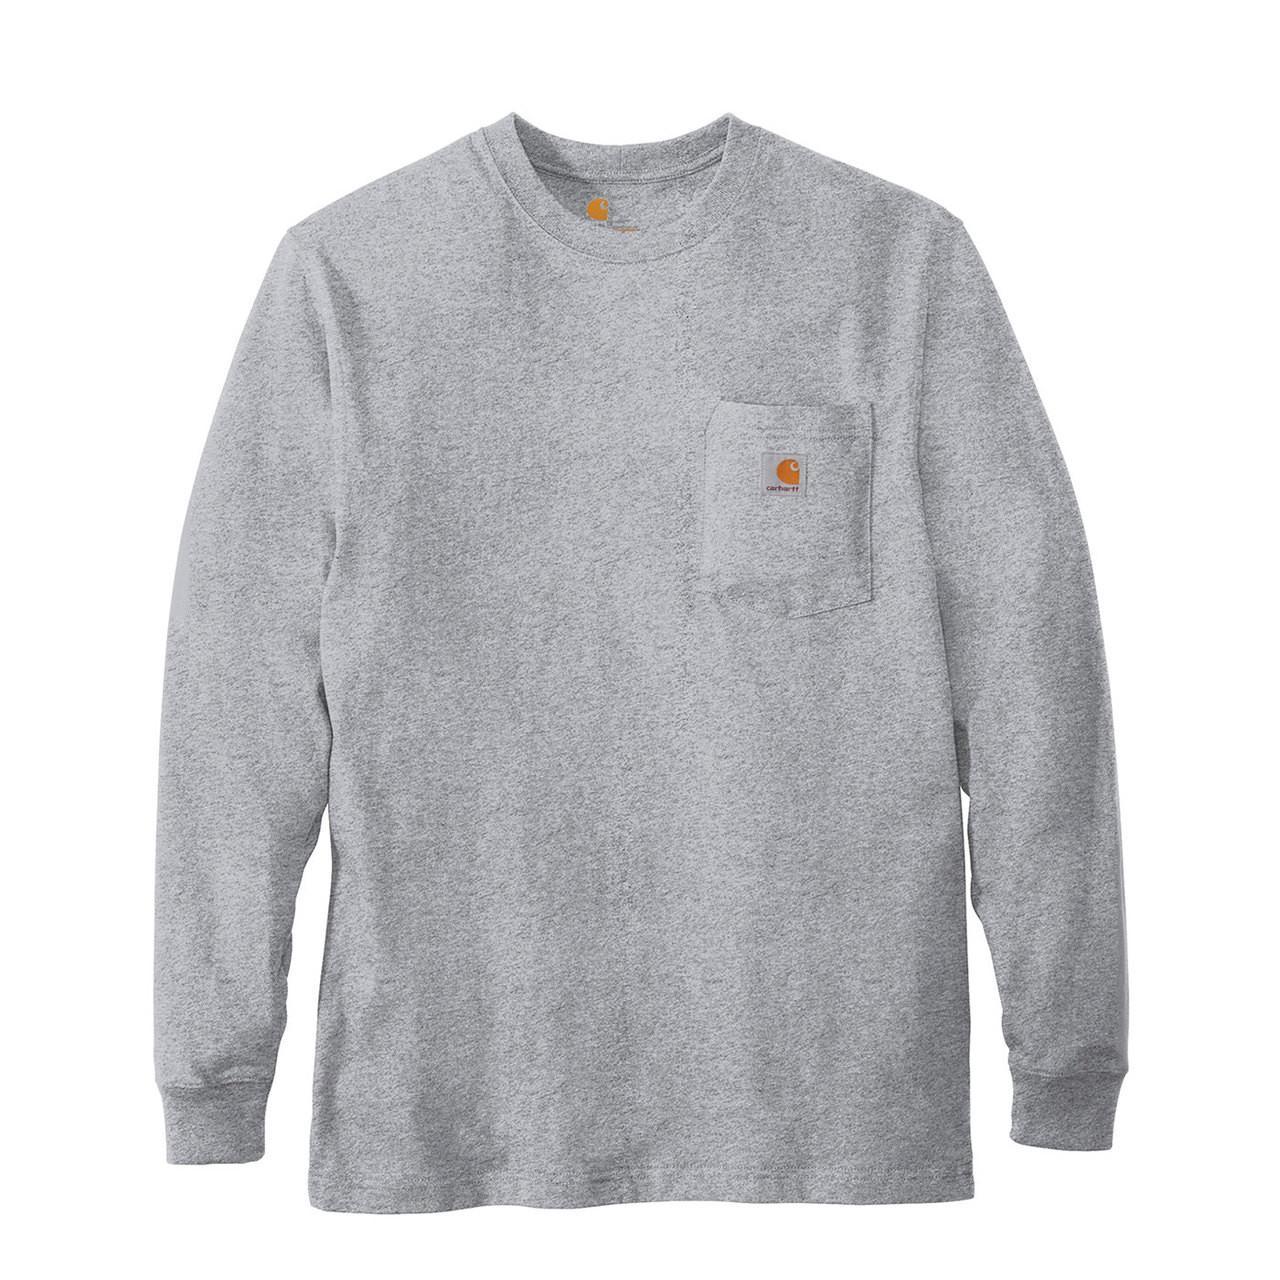 abffec40468b84 Carhartt Long Sleeve T Shirt K126 Heather Gray Front